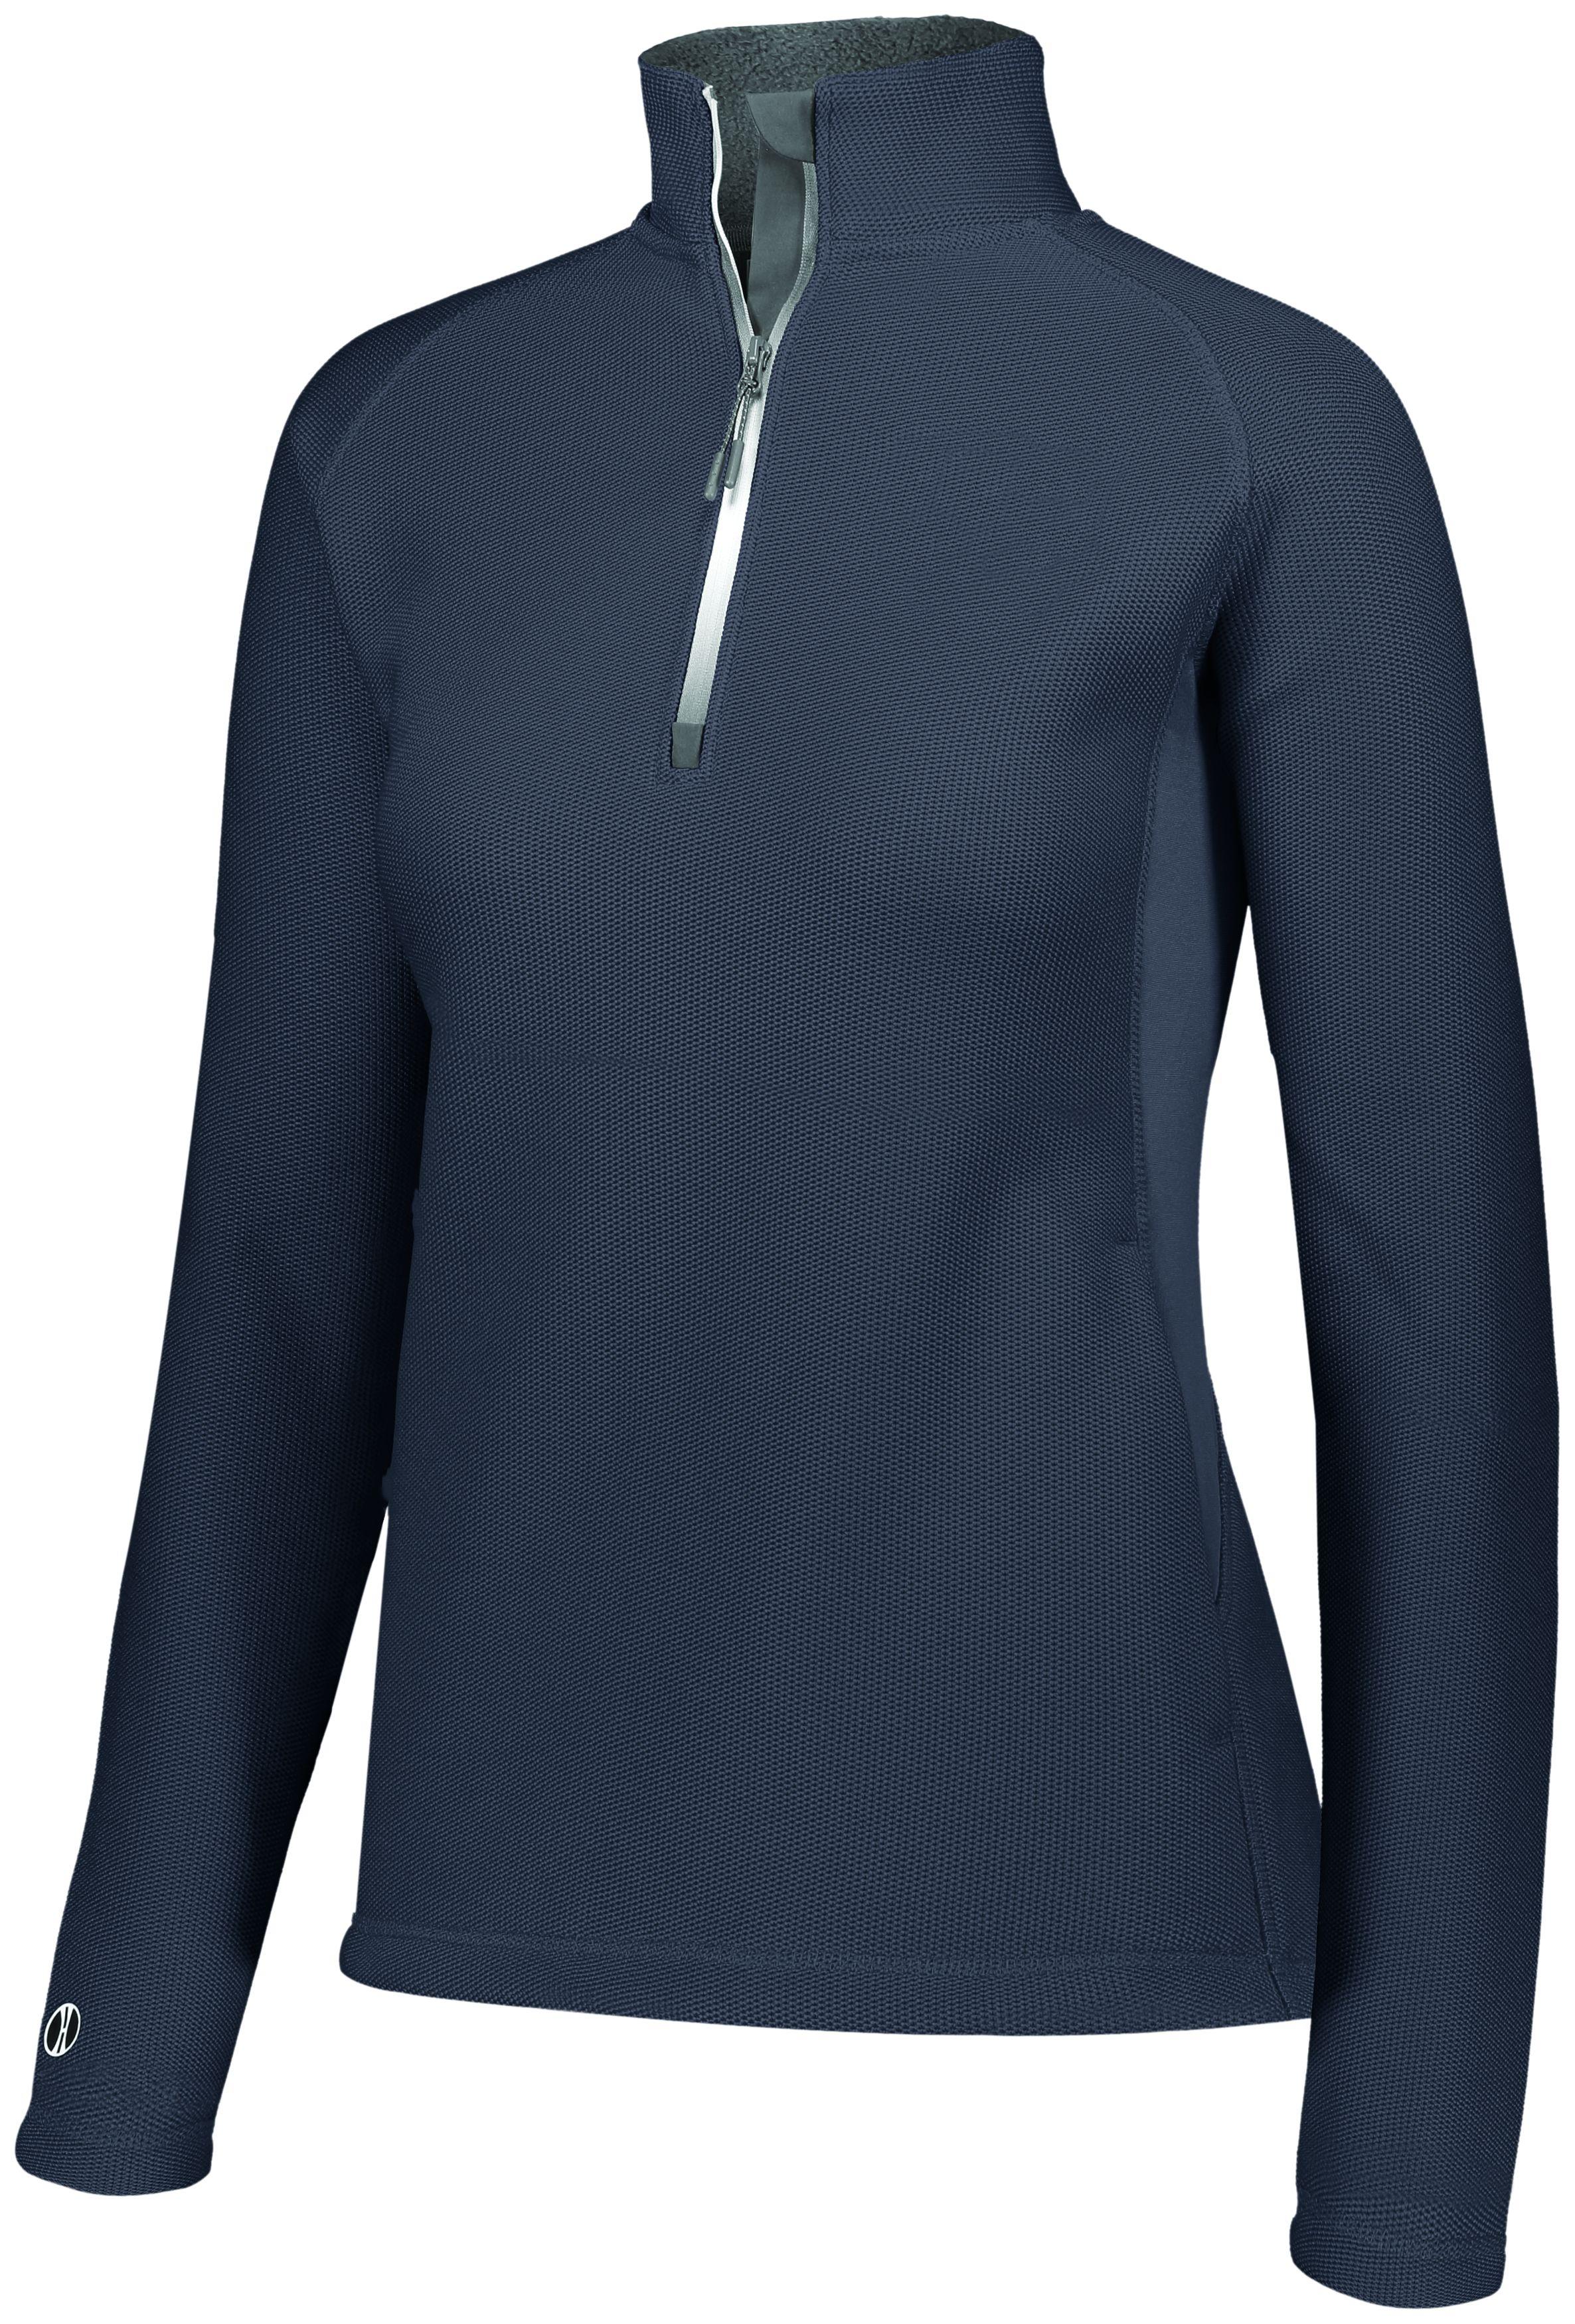 Ladies Invert 1/2 Zip Pullover - CARBON